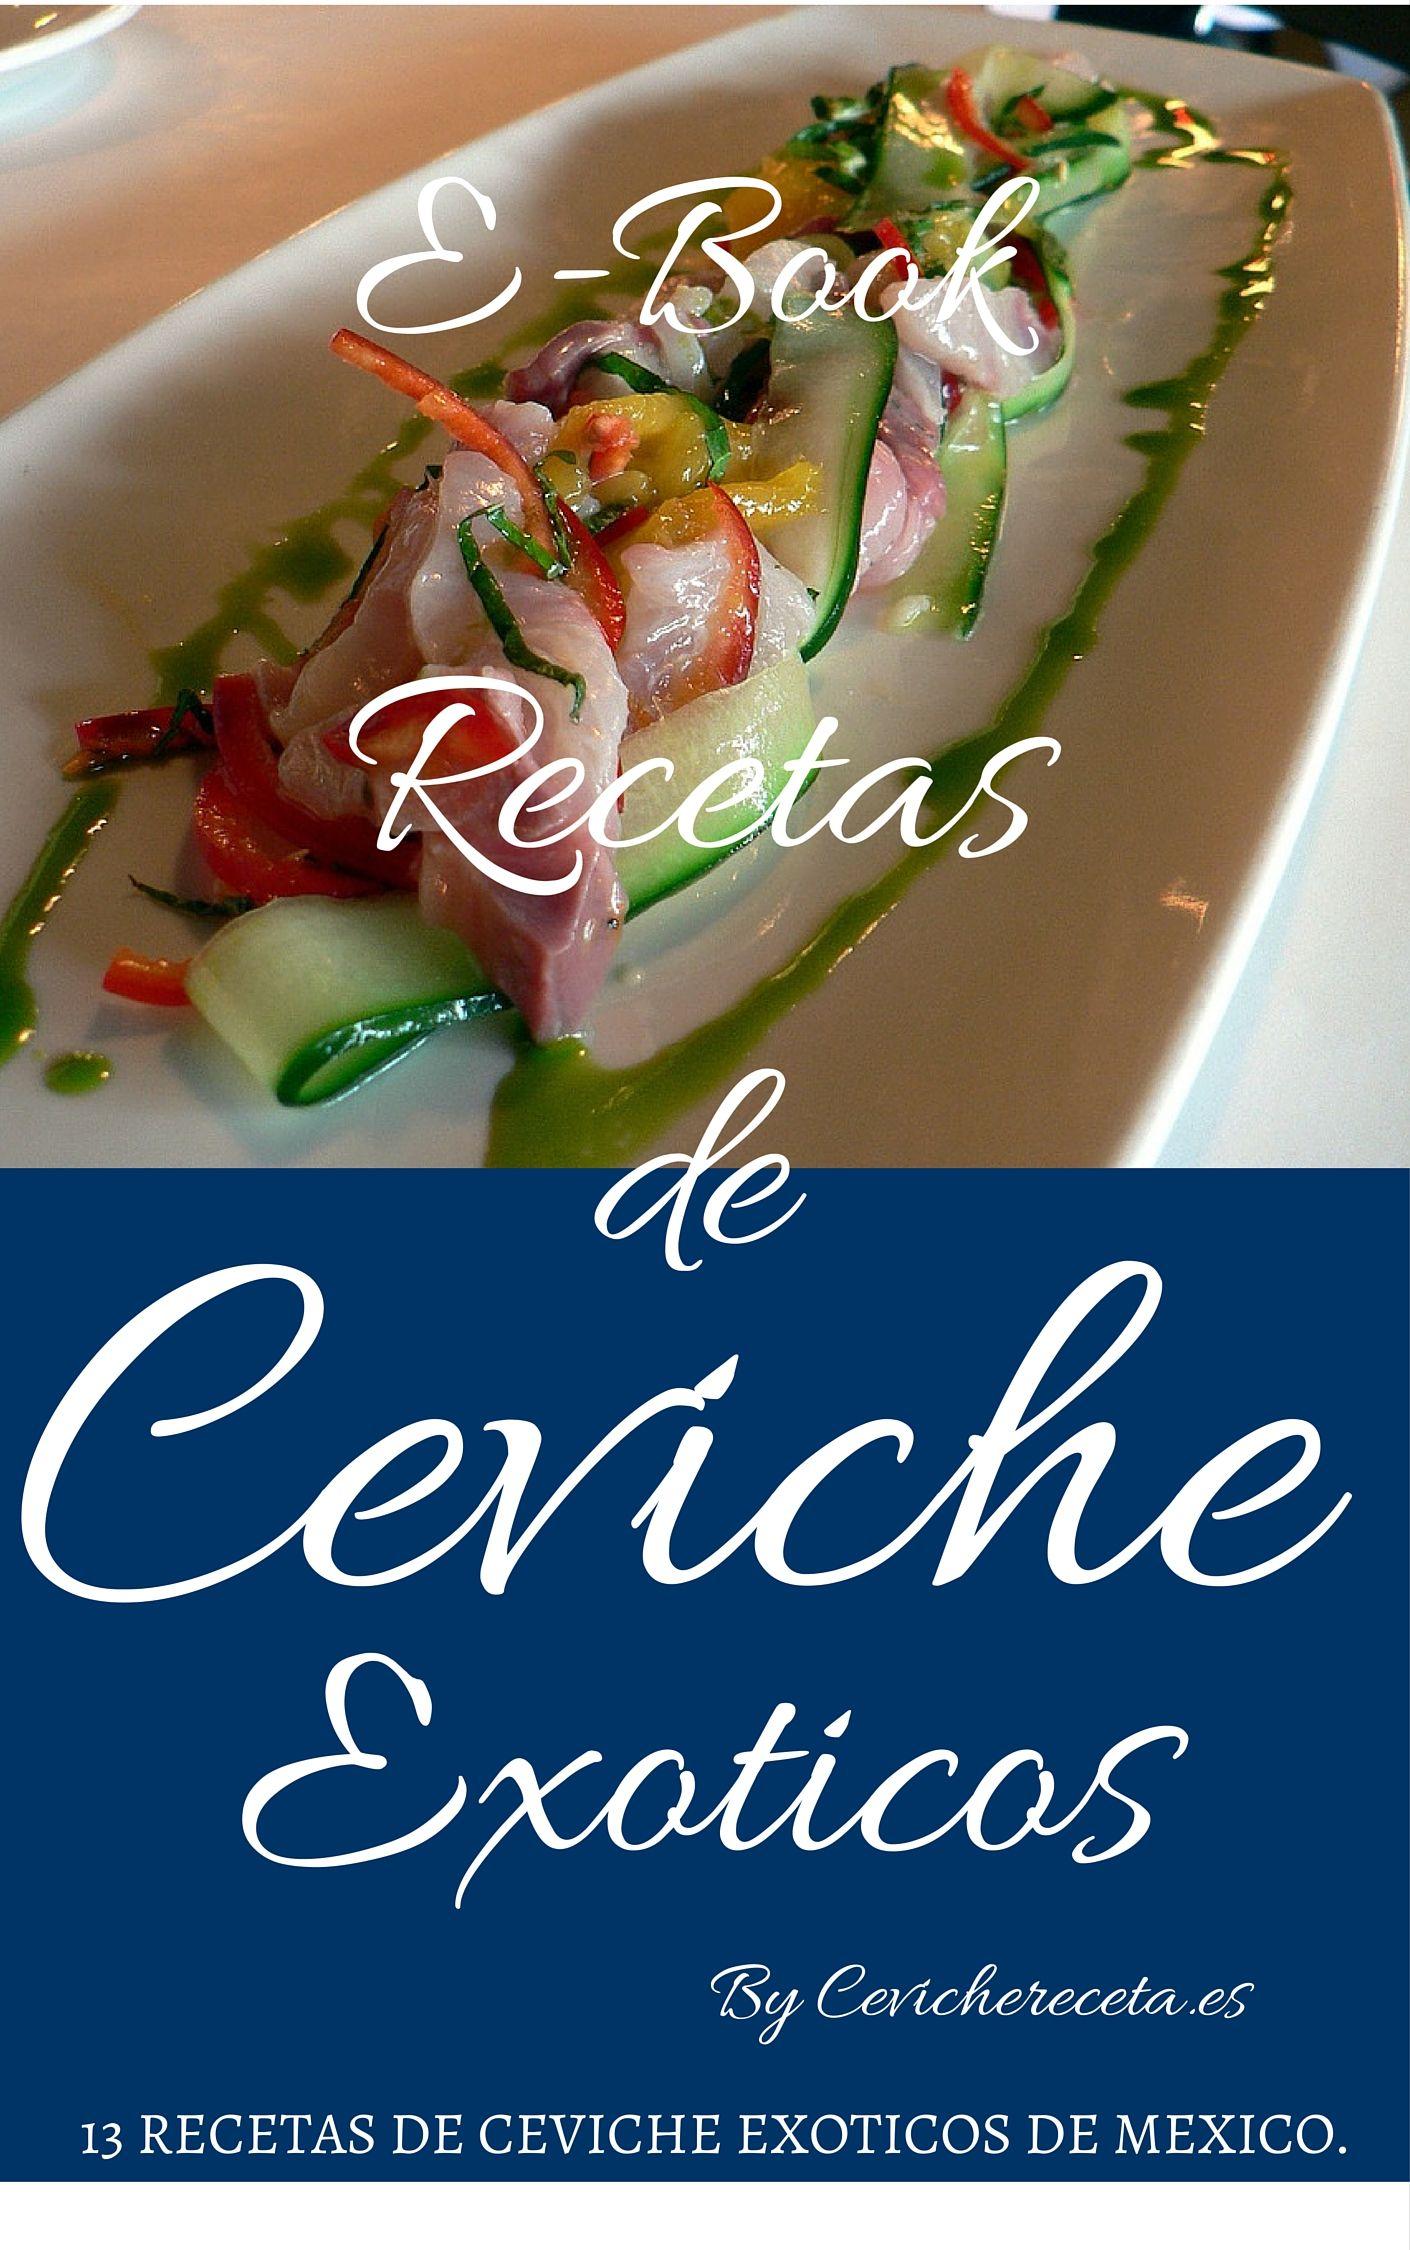 Ceviche Recetas De Ceviche De Todos Los Paises Peruano Ecuatoriano Colombiano Chileno Food Ceviche Food Lover